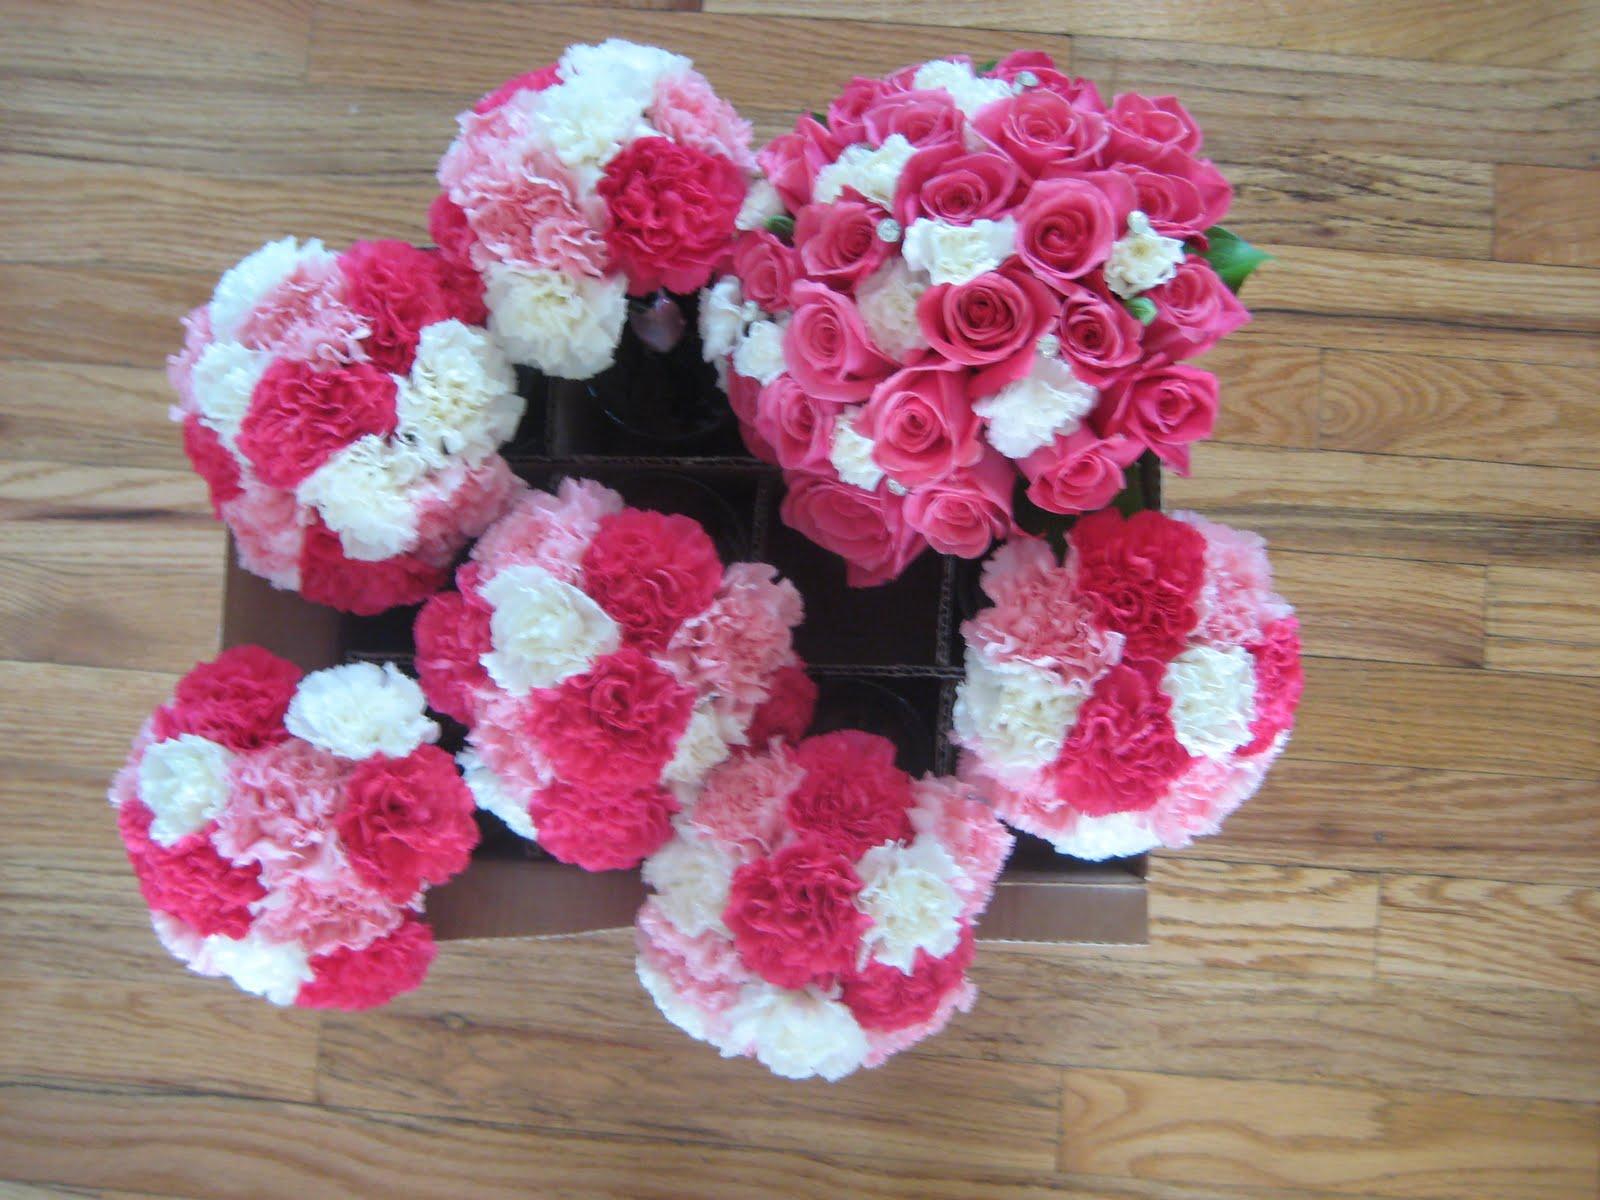 All carnation bridesmaid